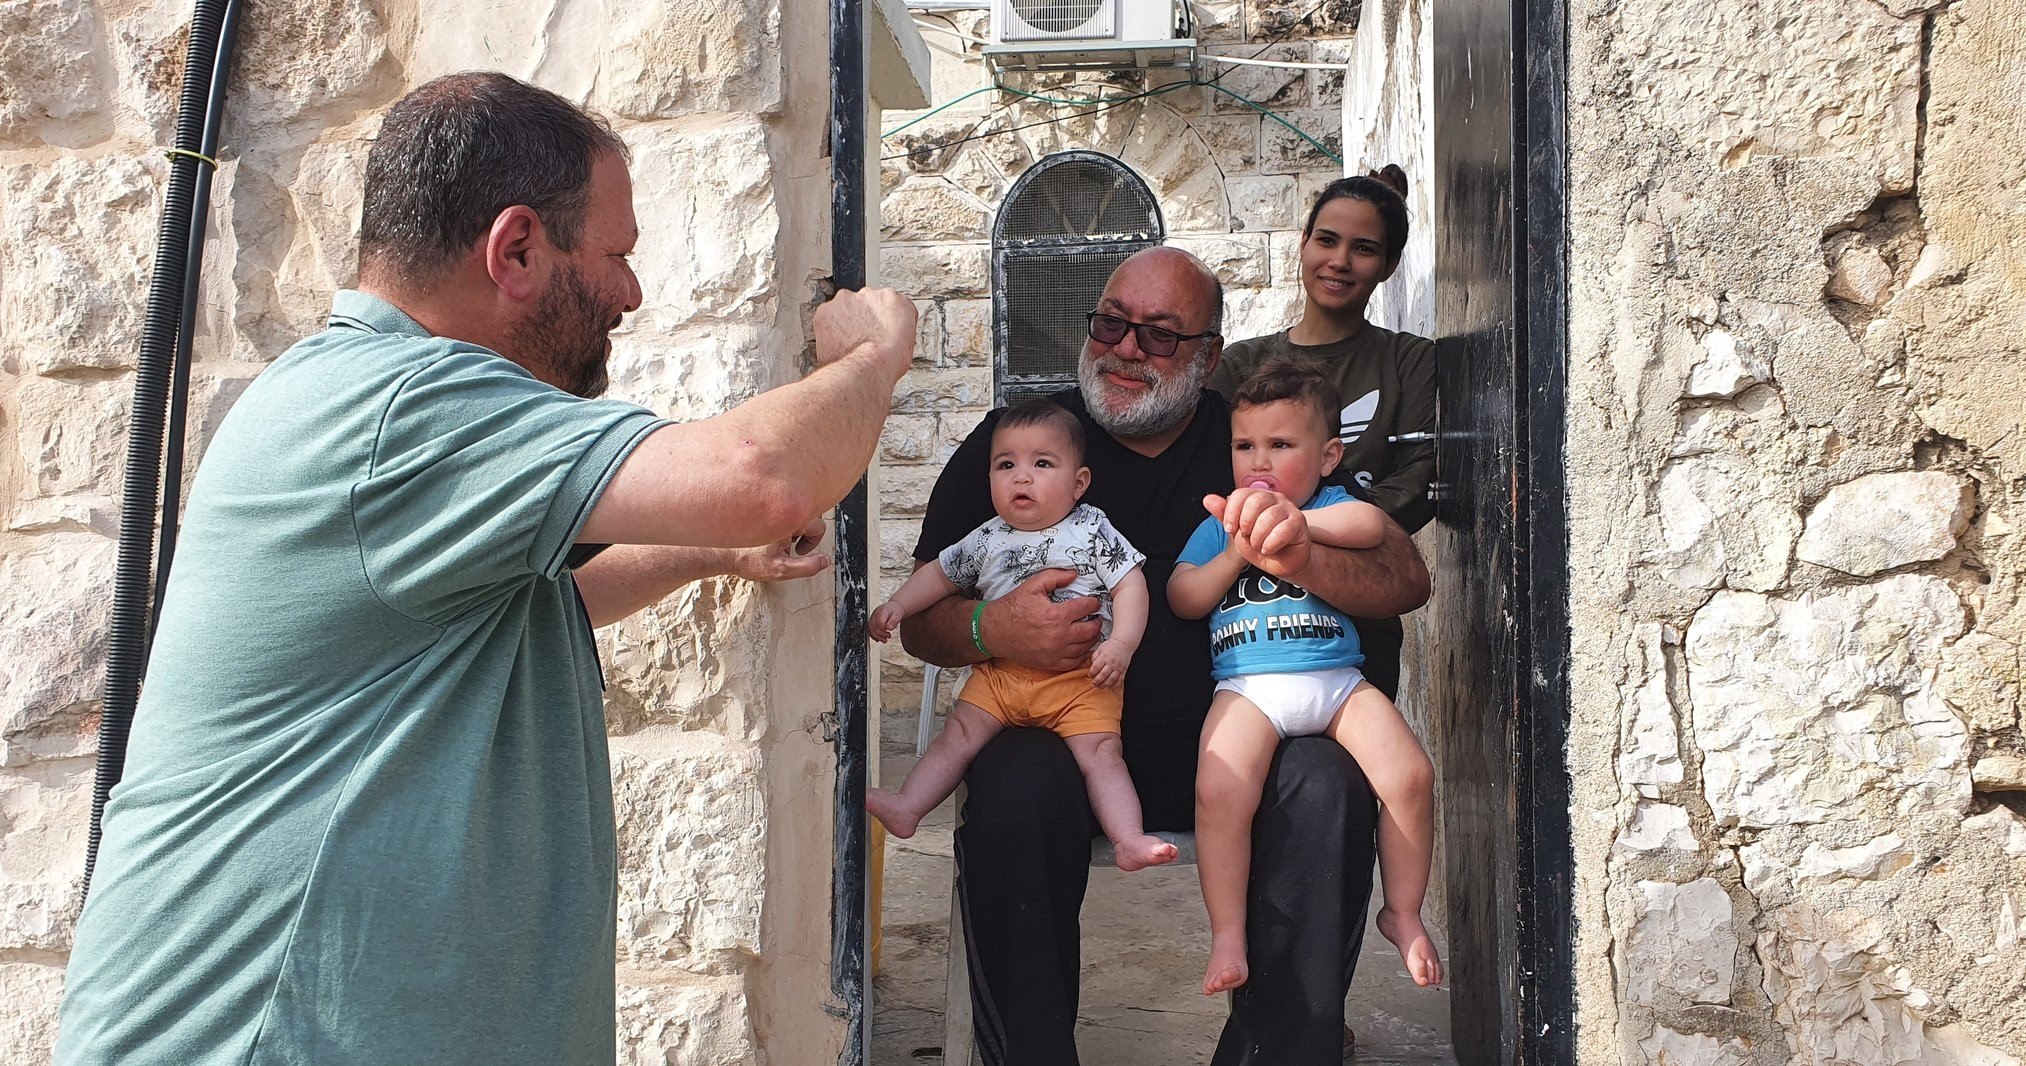 MK Ofer Cassif visiting families in the Palestinian neighborhood of Sheikh Jarrah in occupied East Jerusalem, April 23, 2021